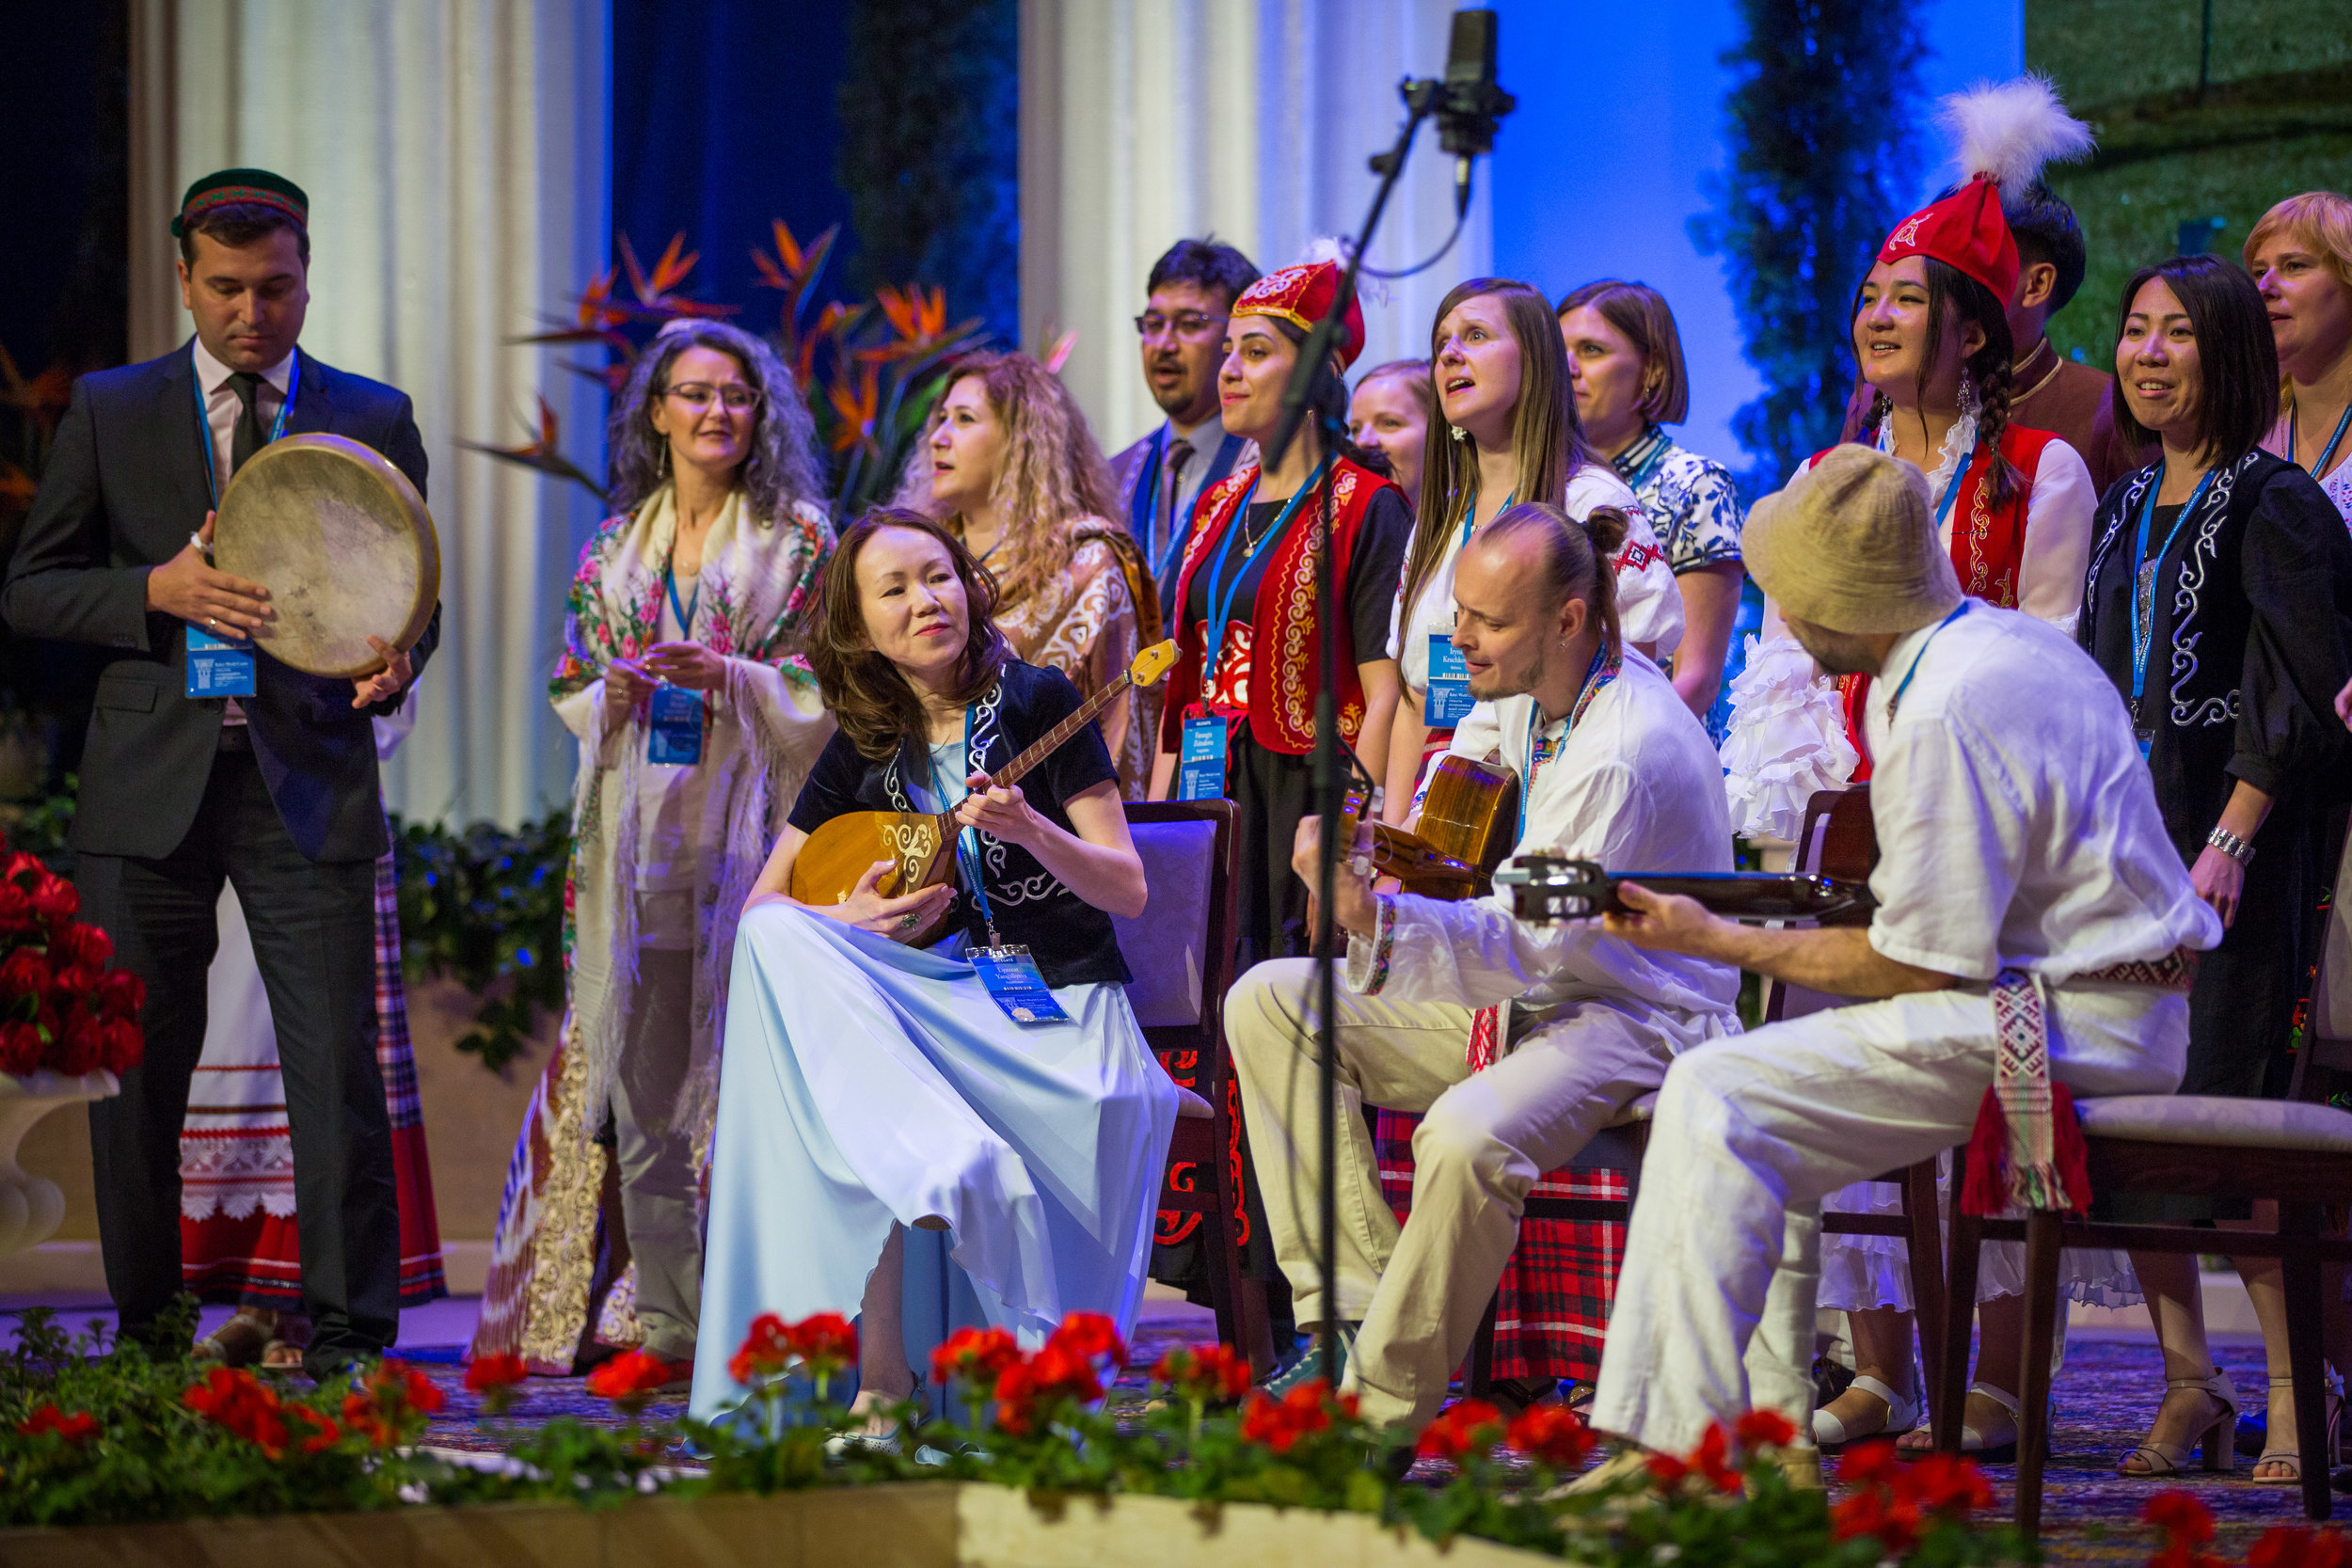 Delegater fra russisktalende land fremfører et musikalsk innslag. Foto: bahai.org